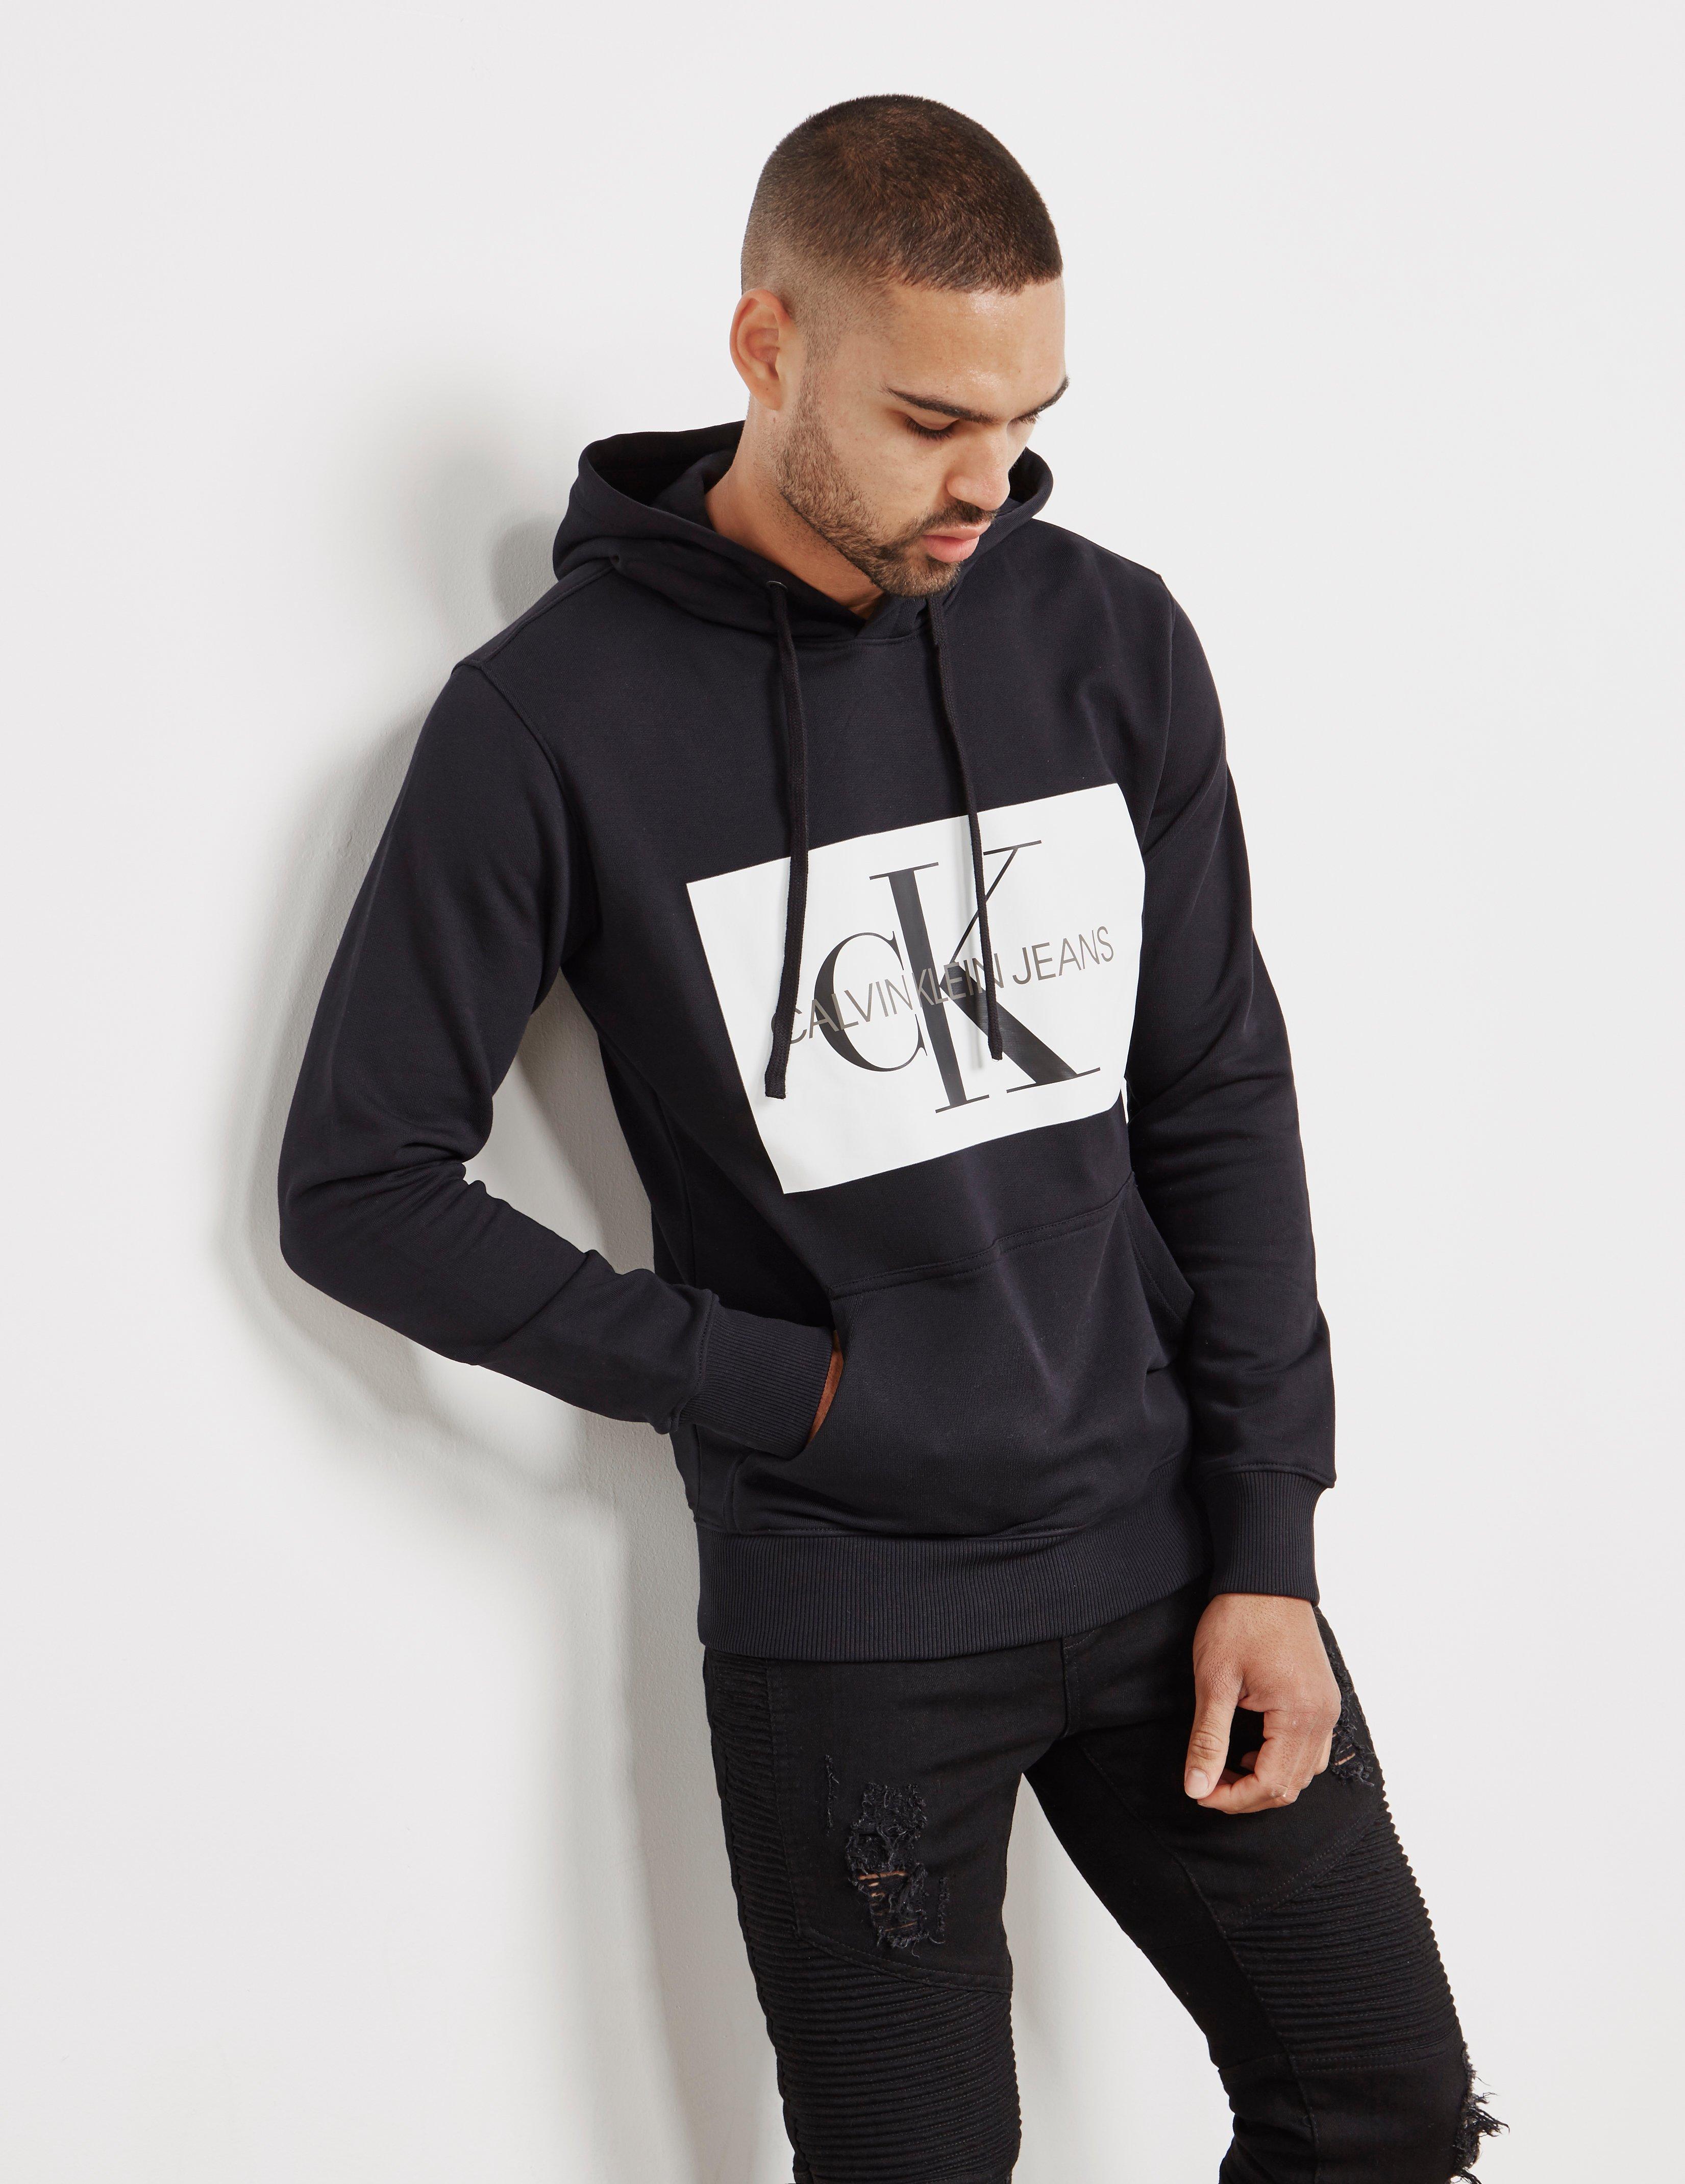 a95c5625ab05 Lyst - Calvin Klein Monogram Box Overhead Hoodie Black in Black for ...